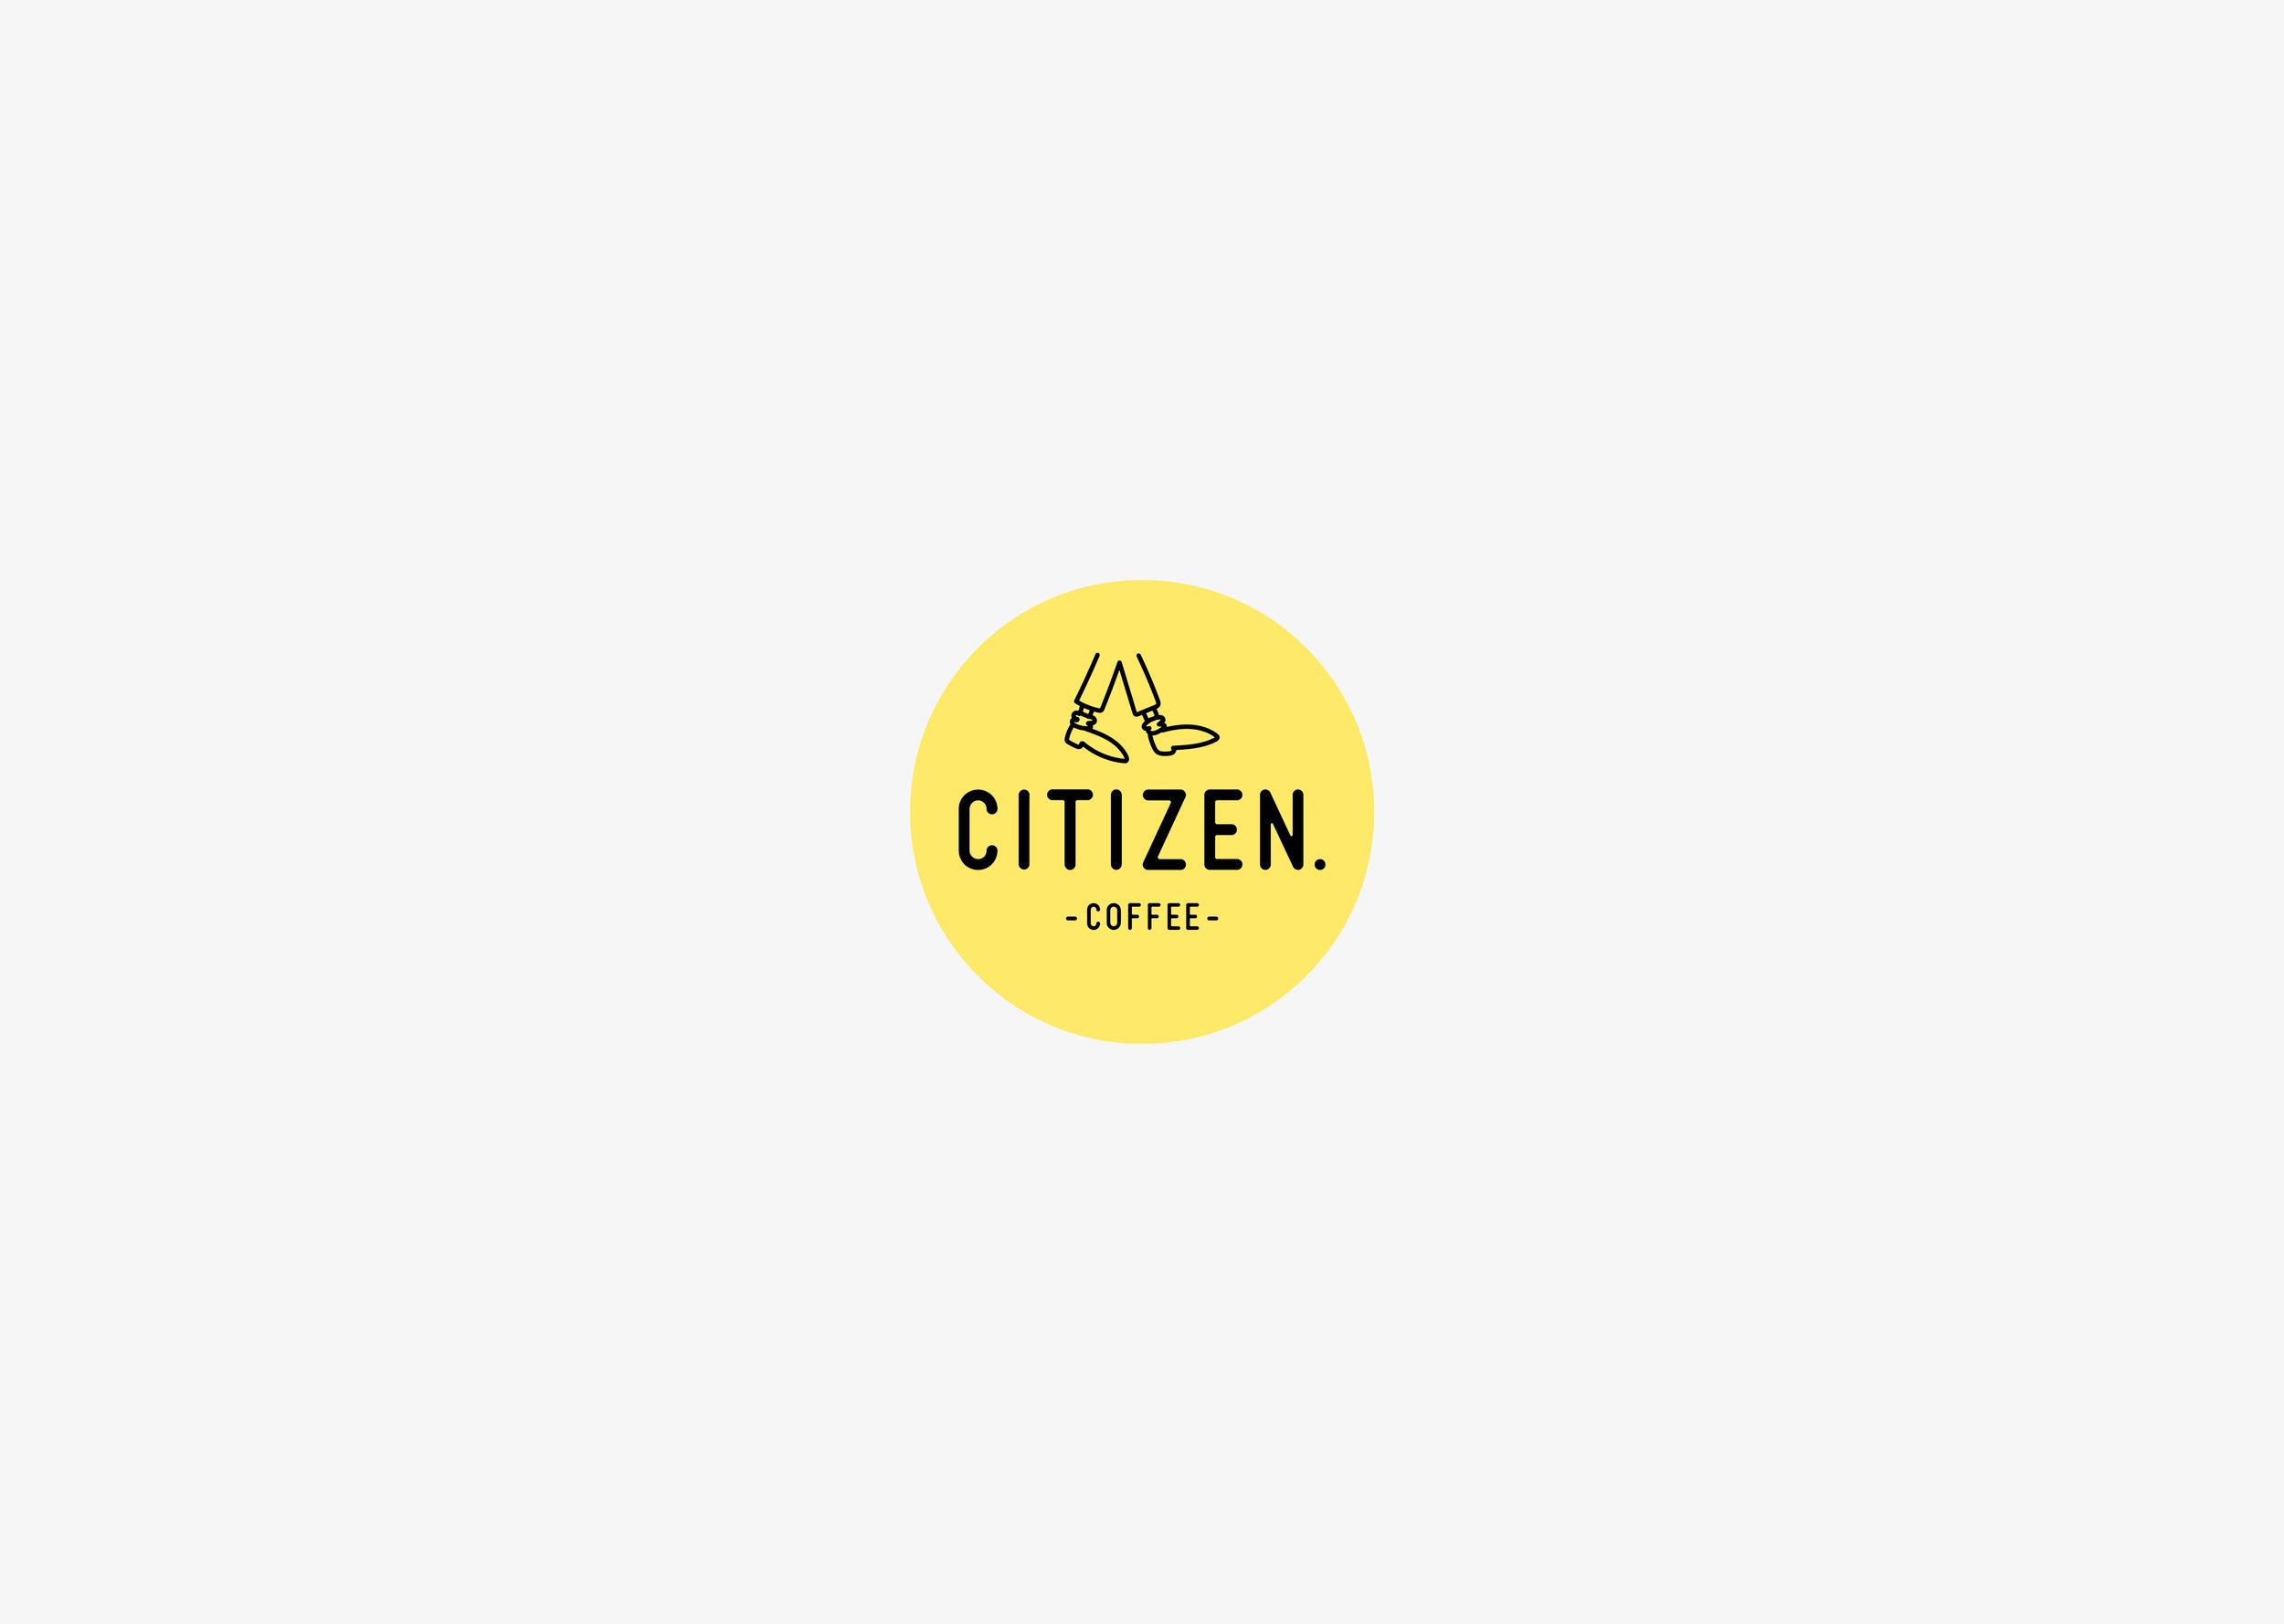 Citizen coffee logo mockup-01.jpg